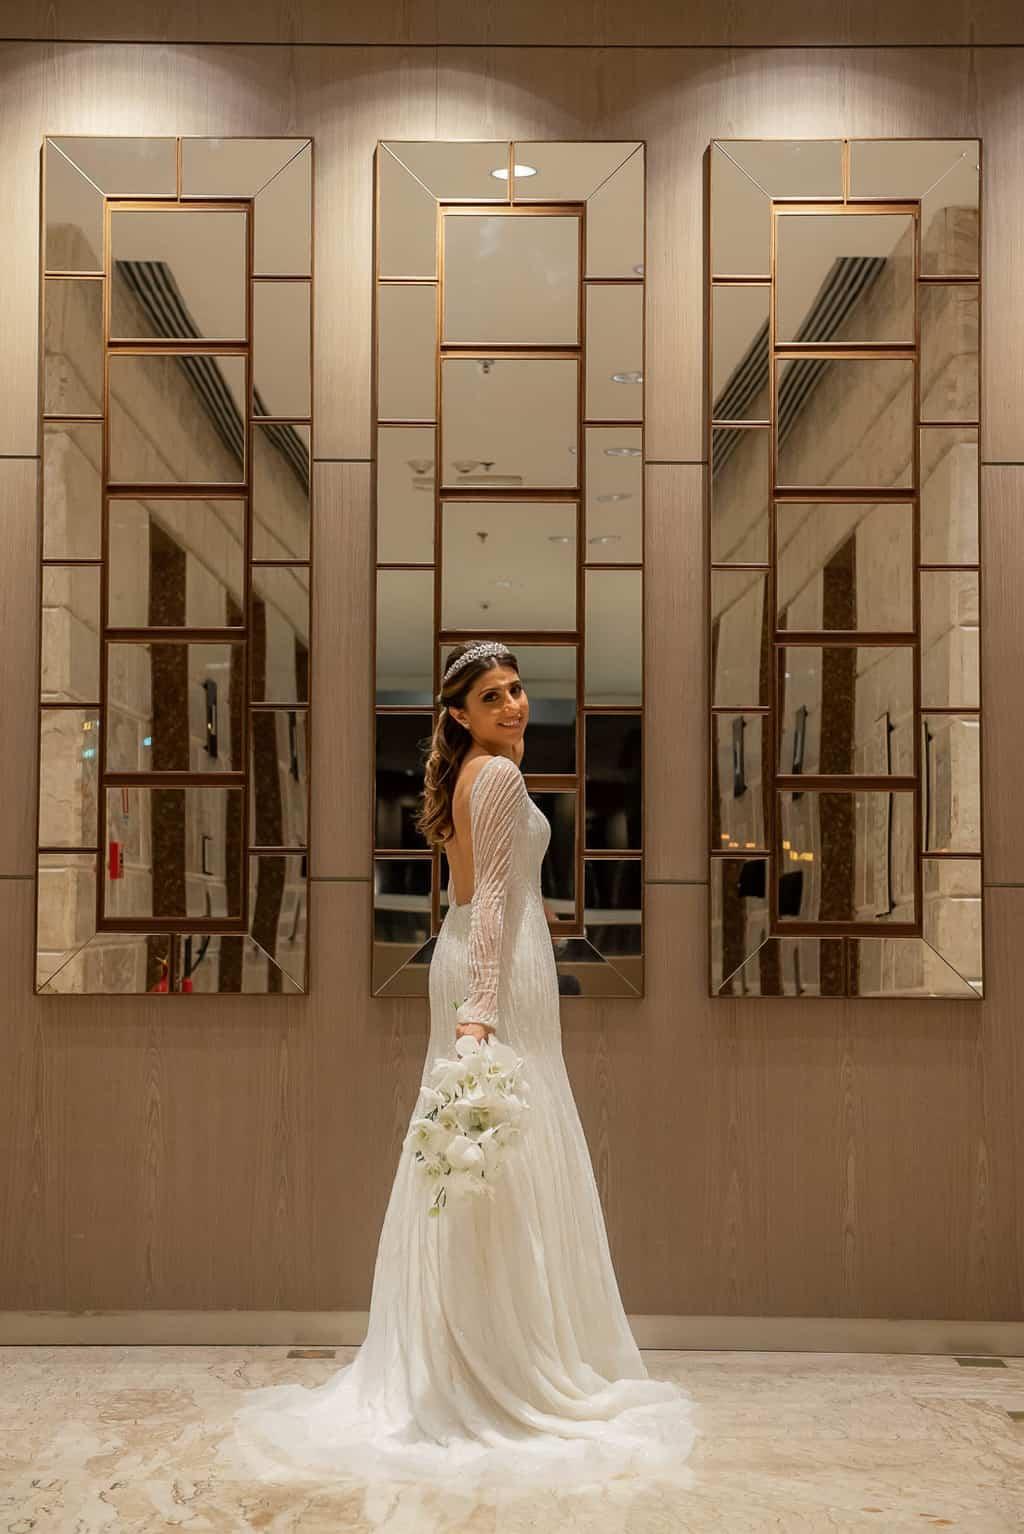 buque-casamento-luiza-e-gustavo-cerimonial-casamento-de-ideias-fotografia-lenine-serejo-making-of-vestido-de-noiva11